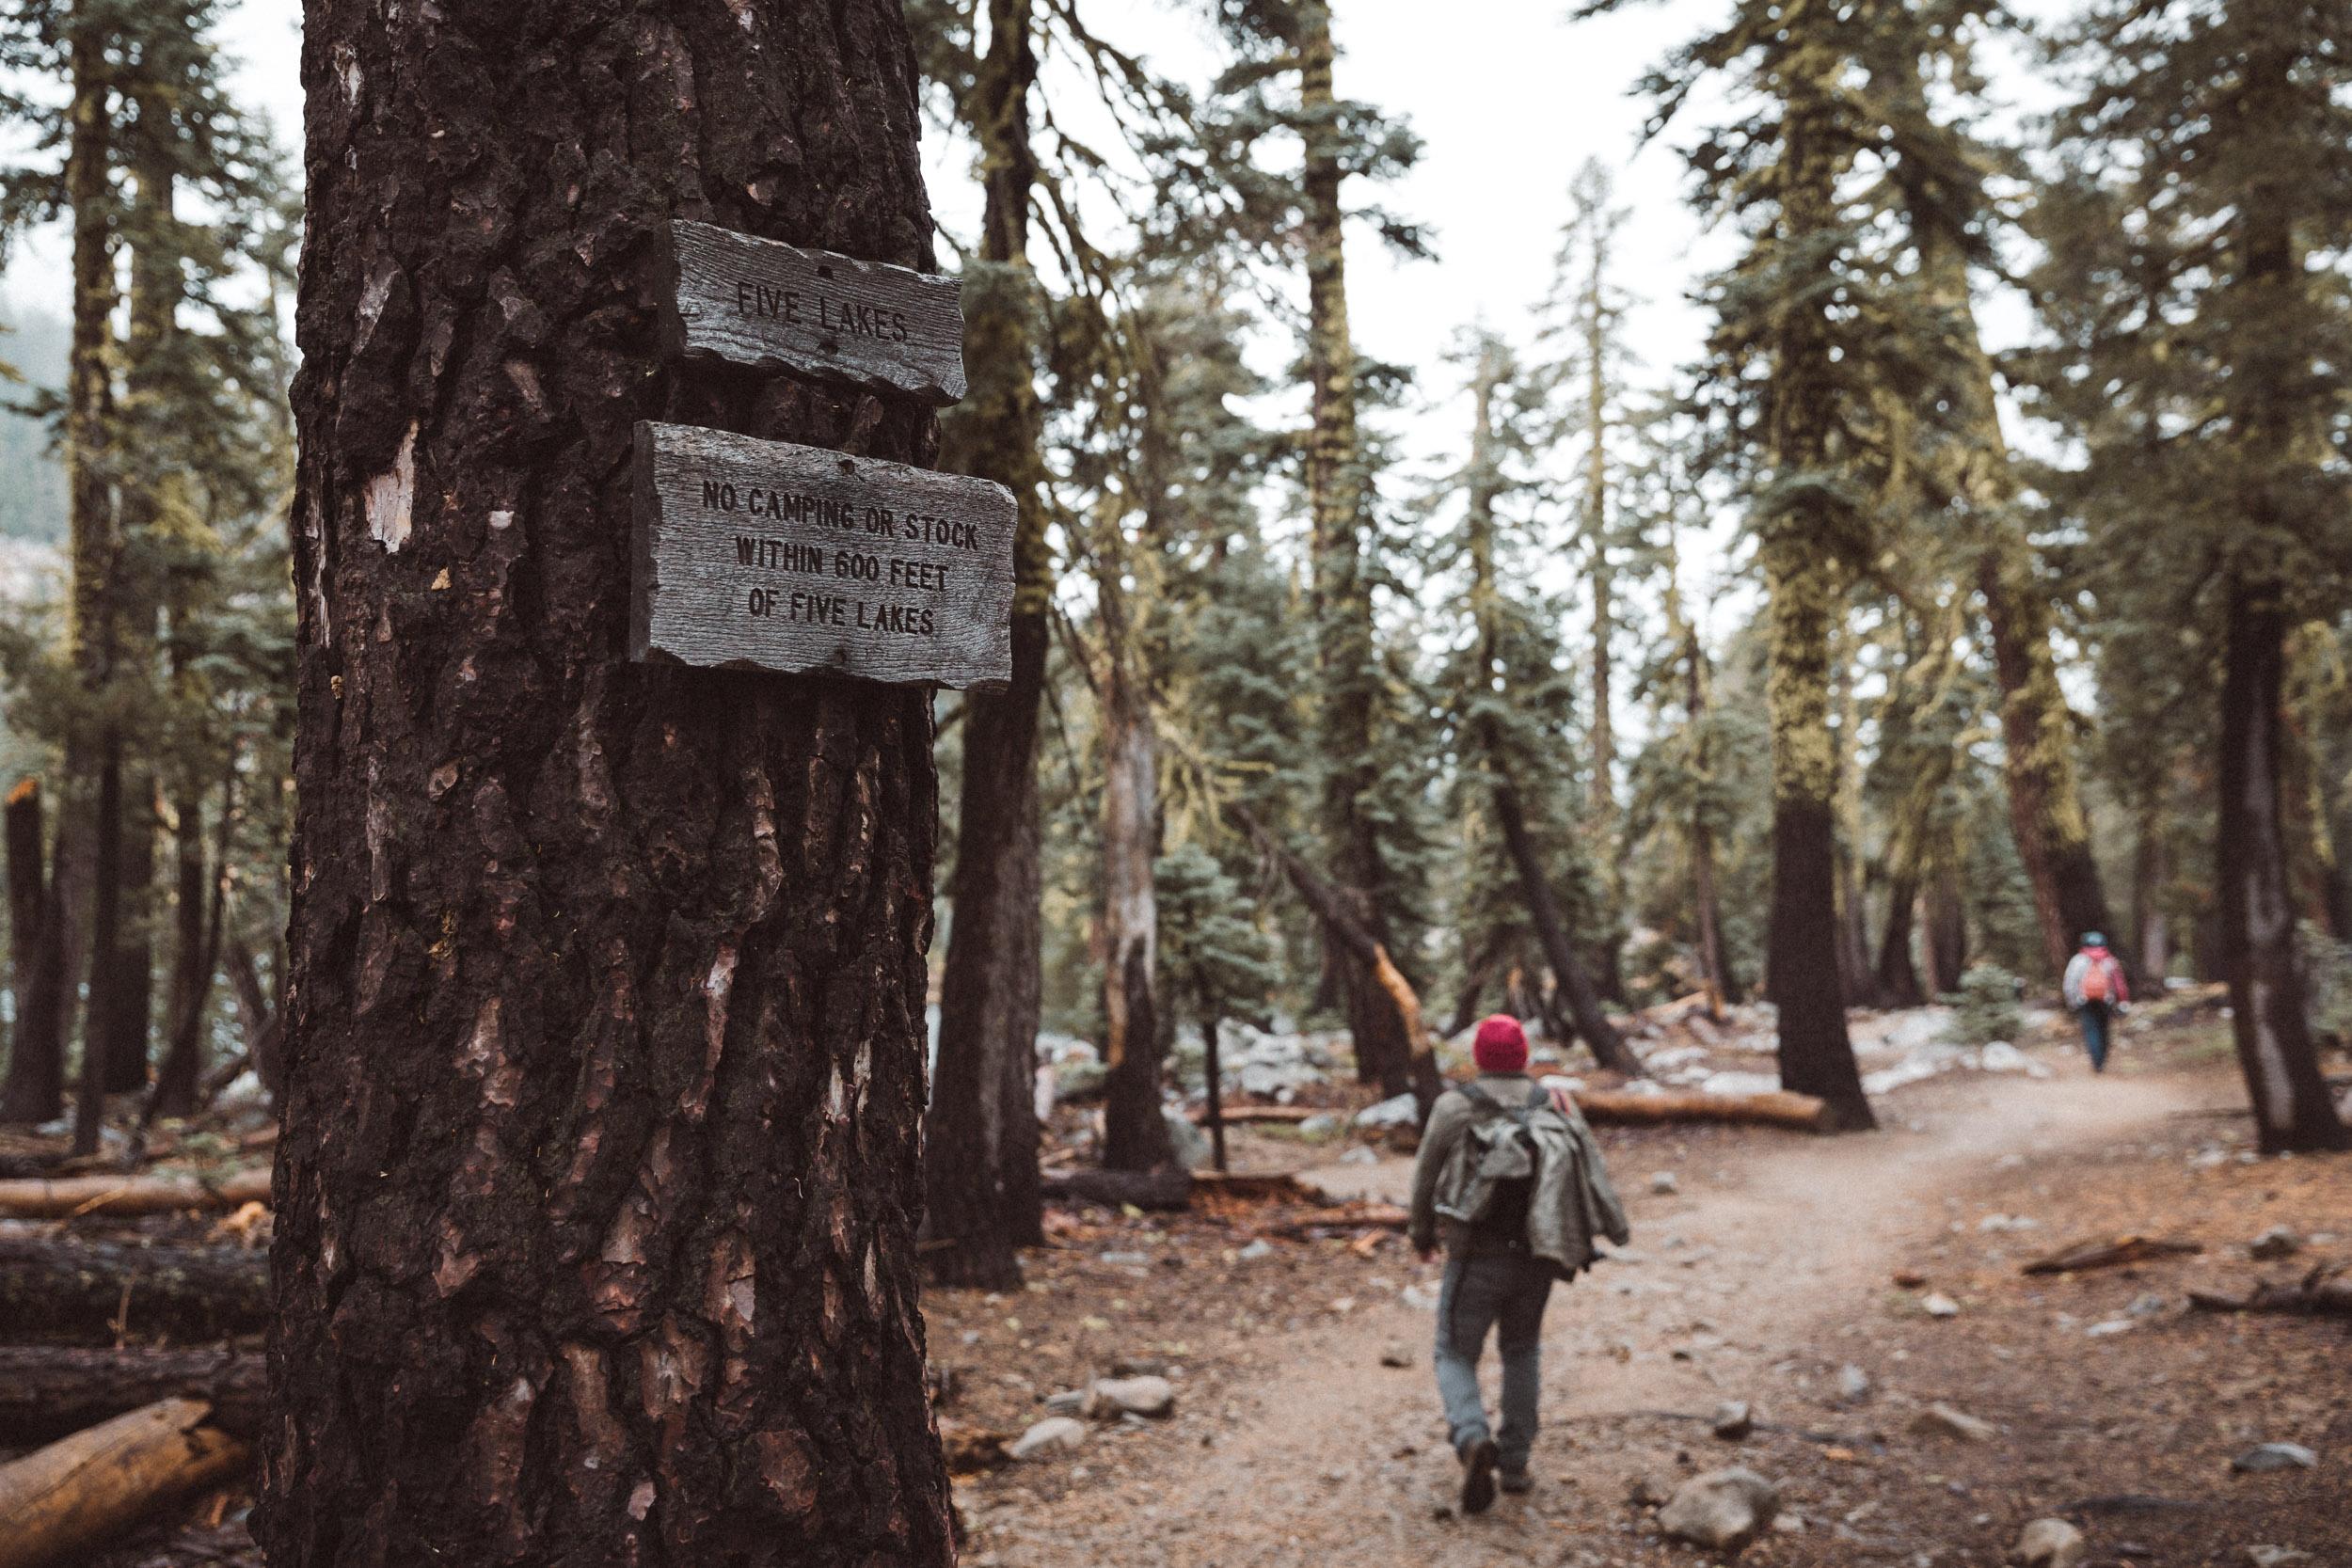 five-lakes-trail-hike-and-shoot-4.jpg